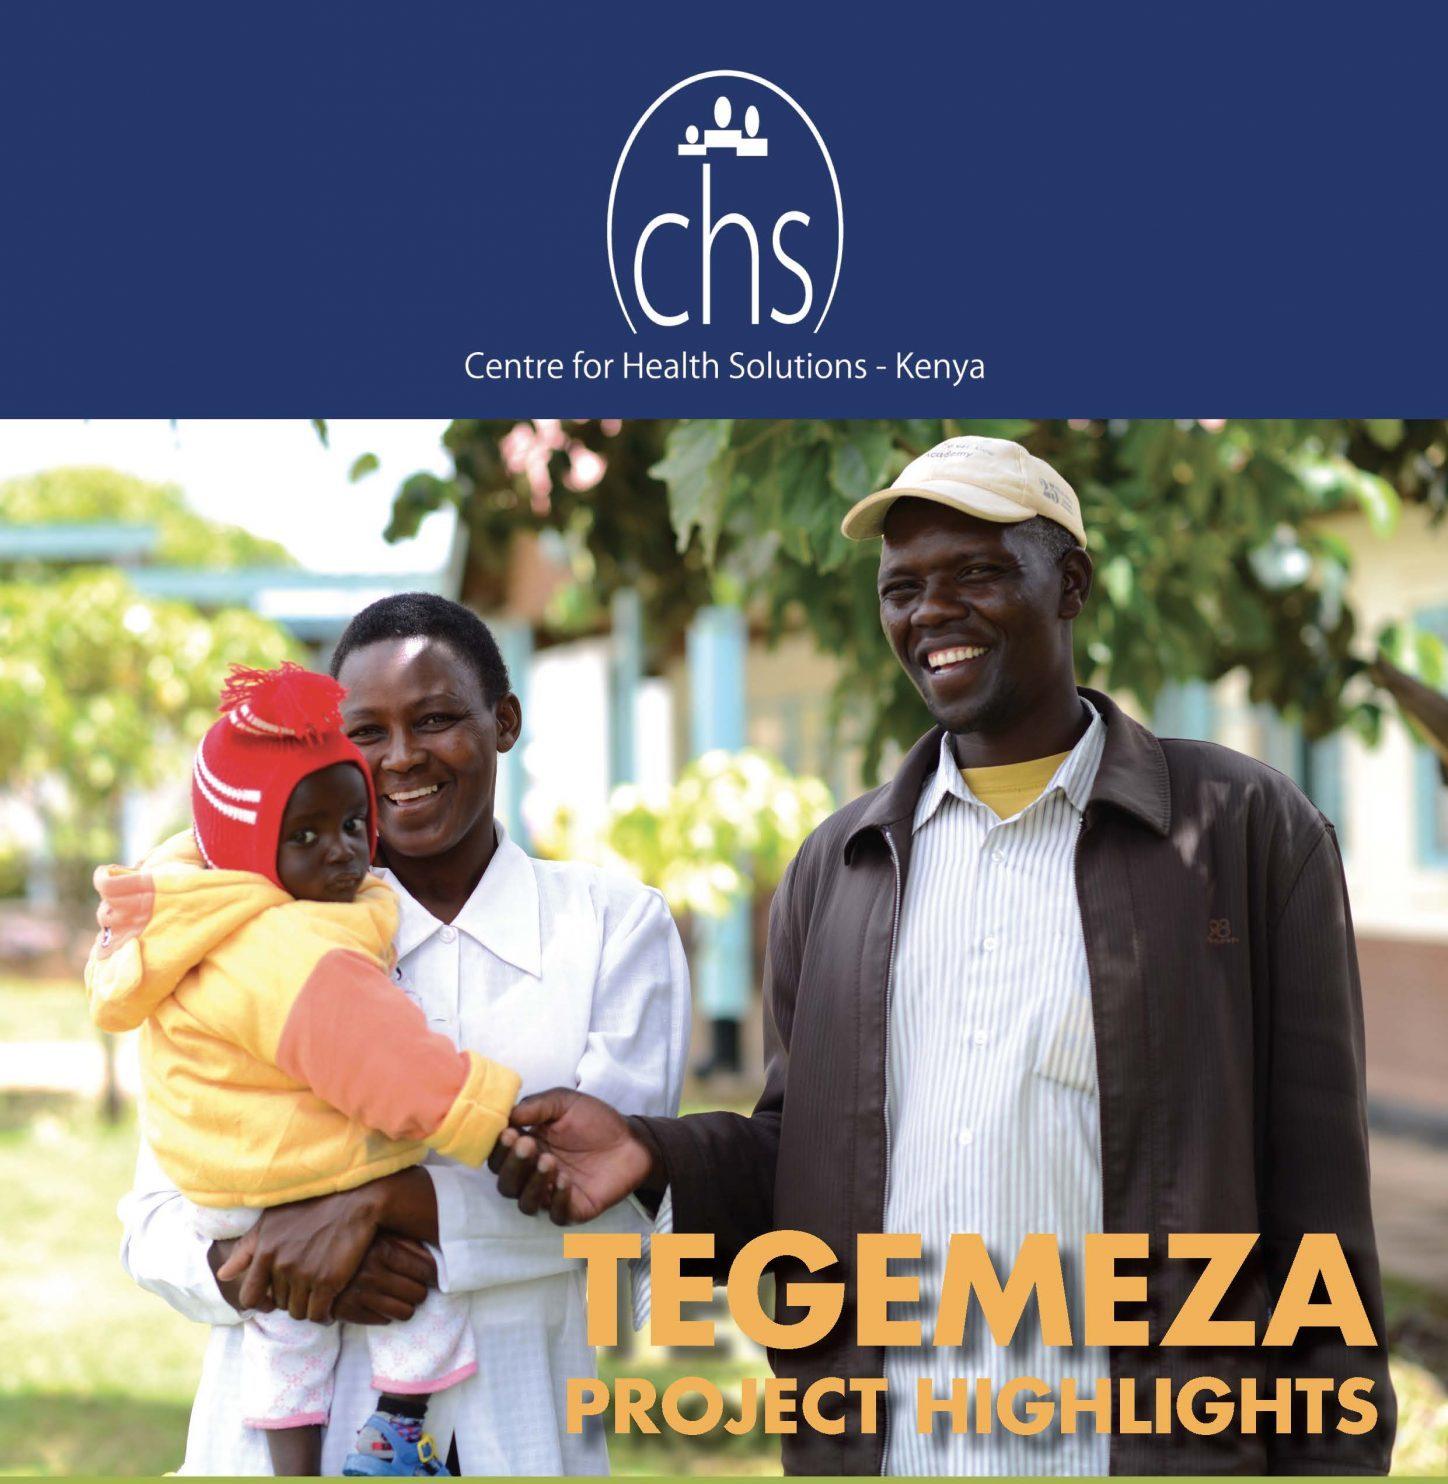 Tegemeza Project Highlights